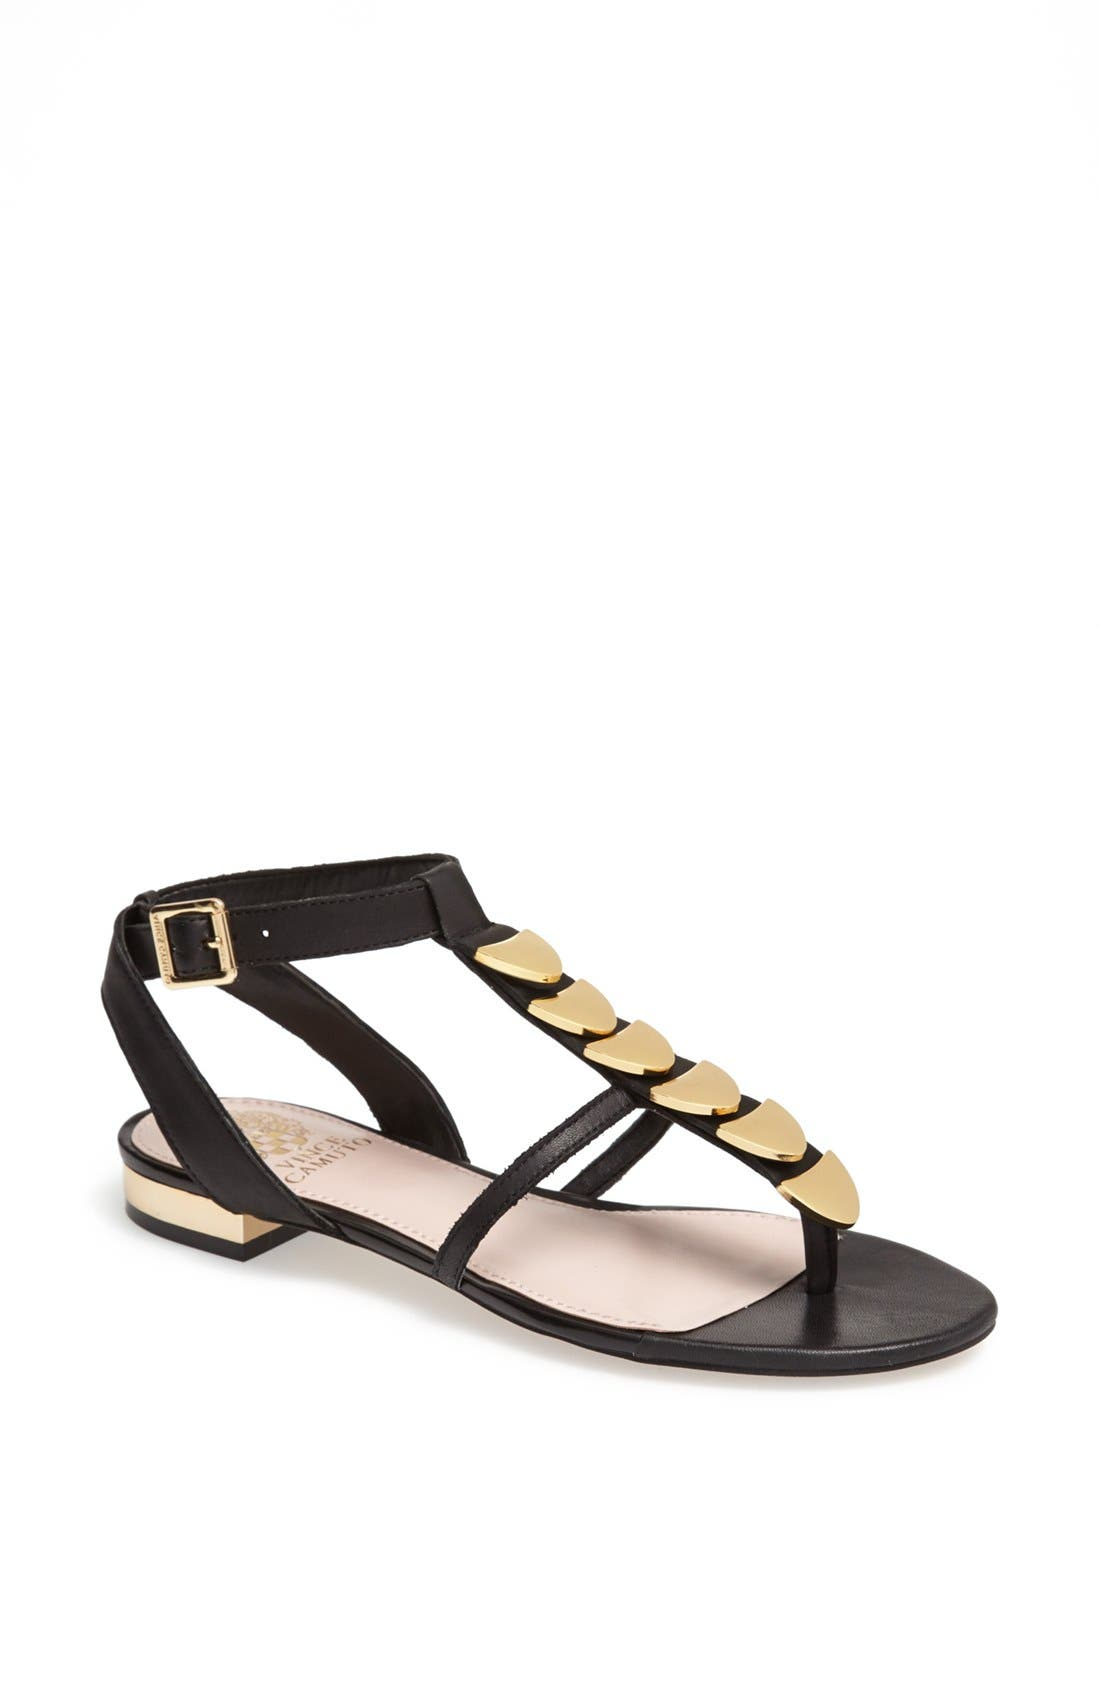 Alternate Image 1 Selected - Vince Camuto 'Himila' Sandal